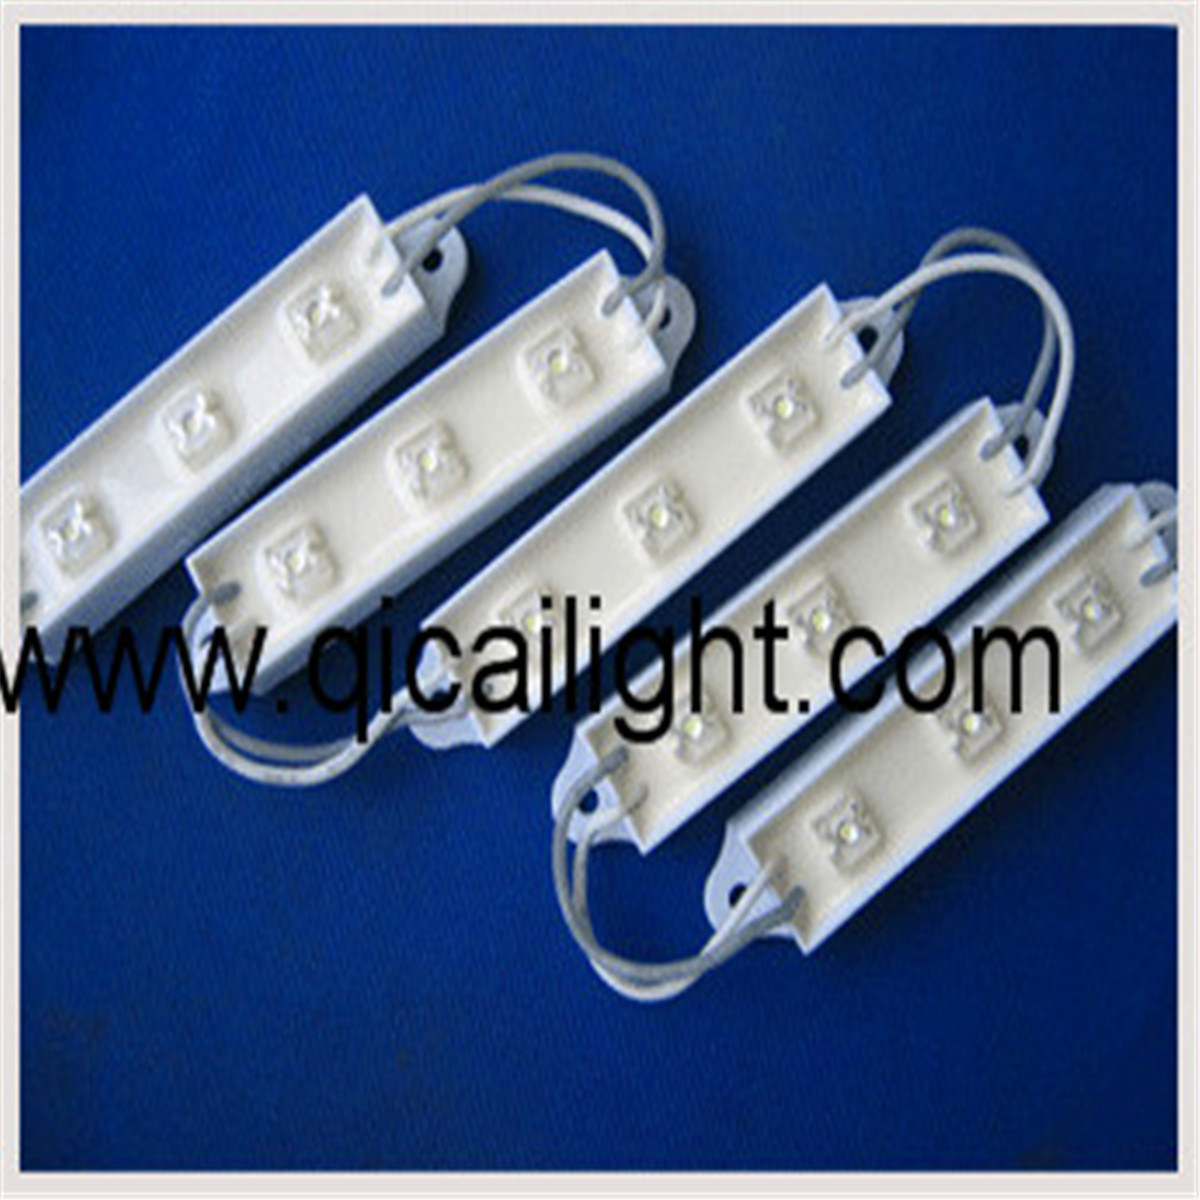 5050 Waterproof LED Module 3LED/PCS